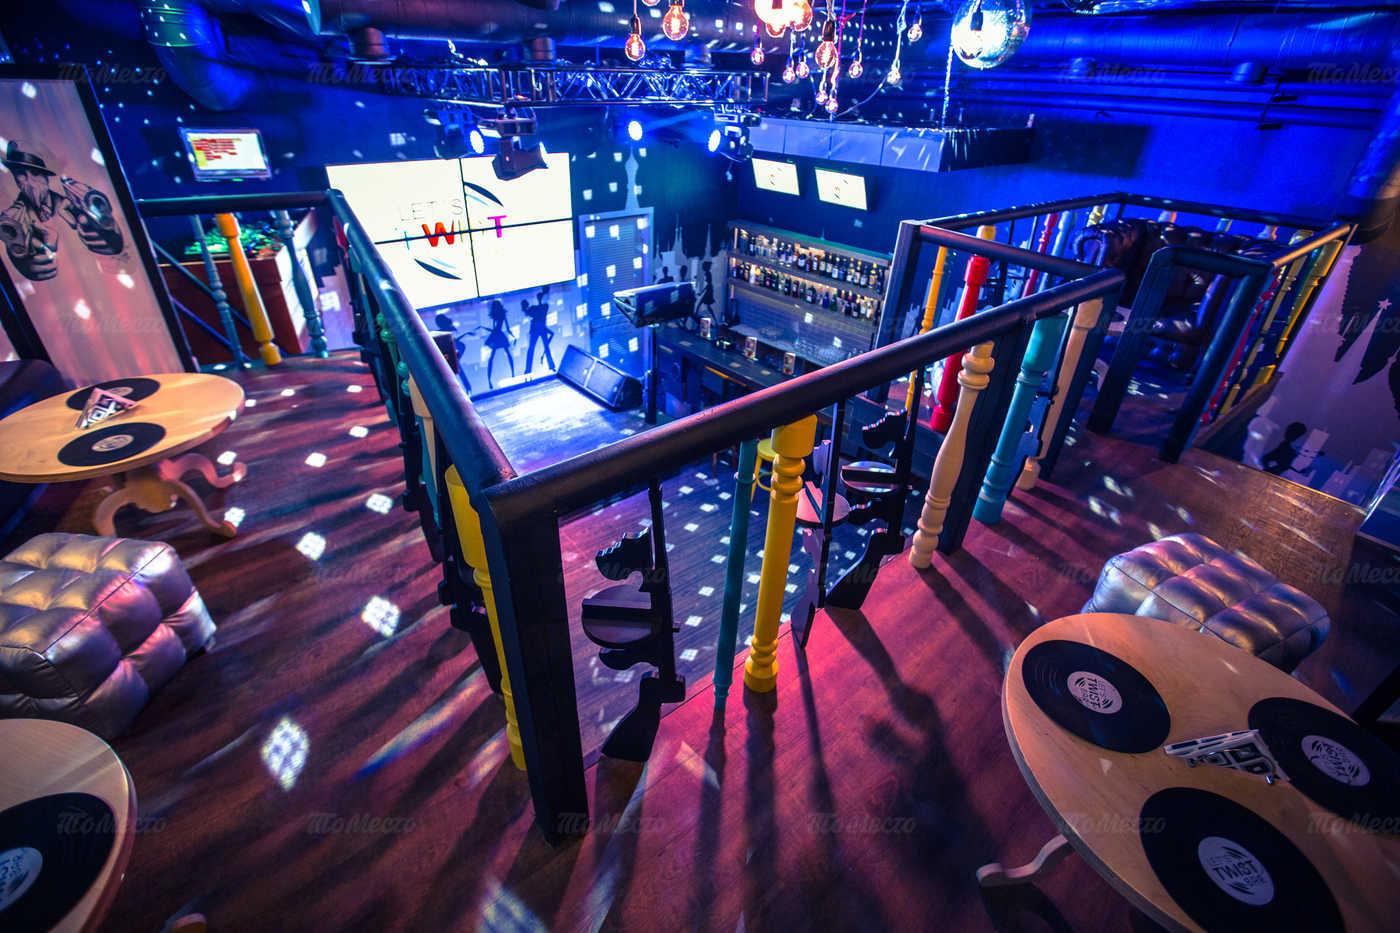 Меню бара, ночного клуба Let's Twist (Лэтс Твист) на Комсомольском проспекте